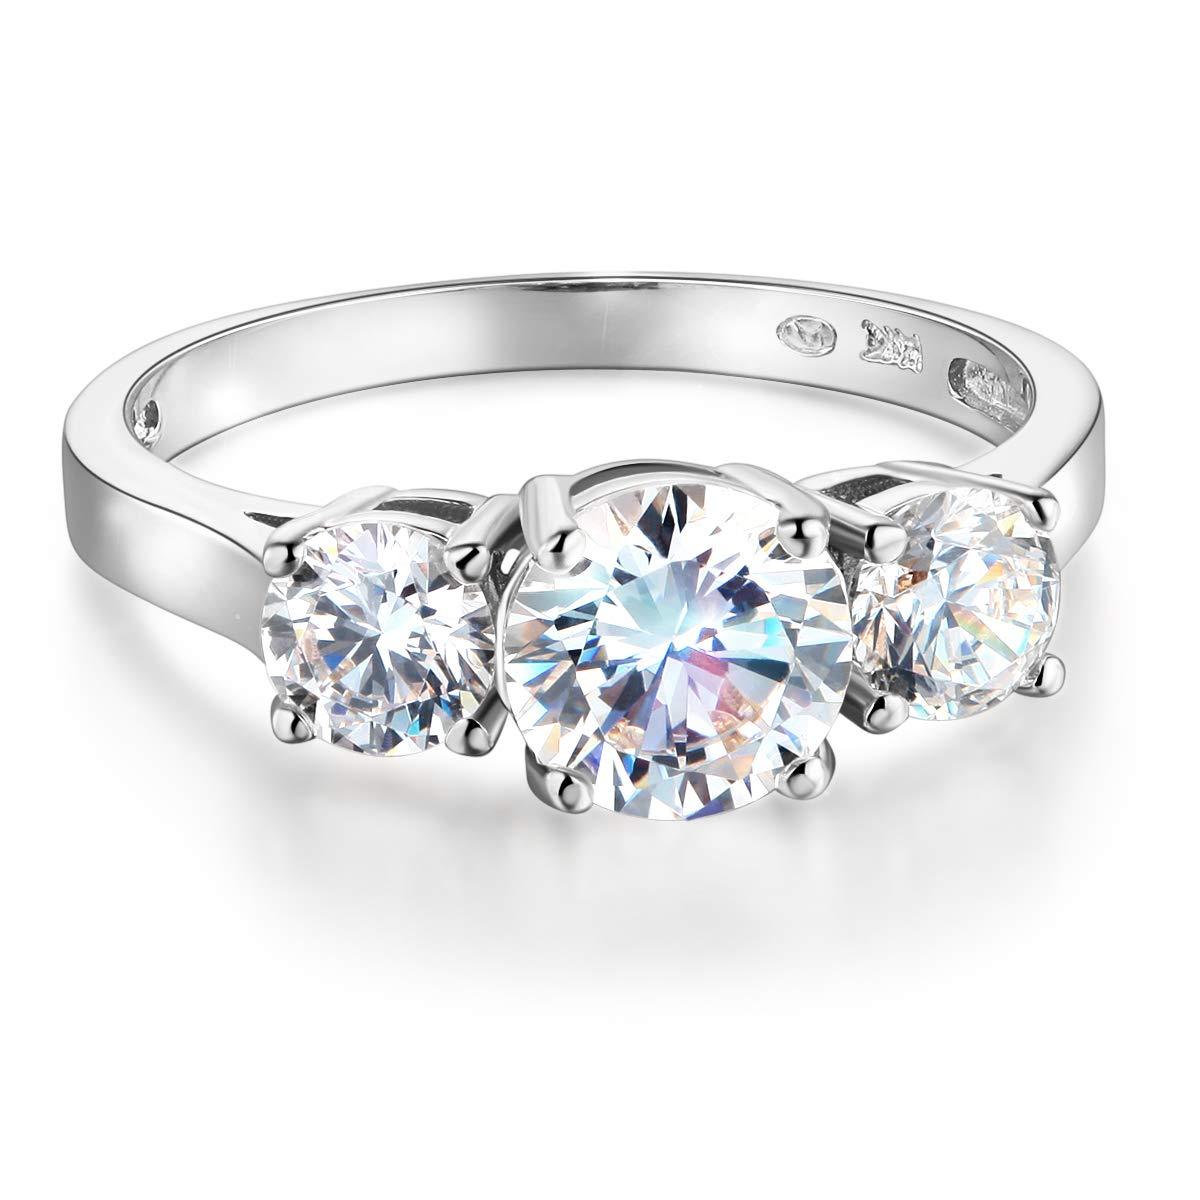 Wellingsale Ladies 925 Sterling Silver Polished Rhodium Wedding Engagement Ring